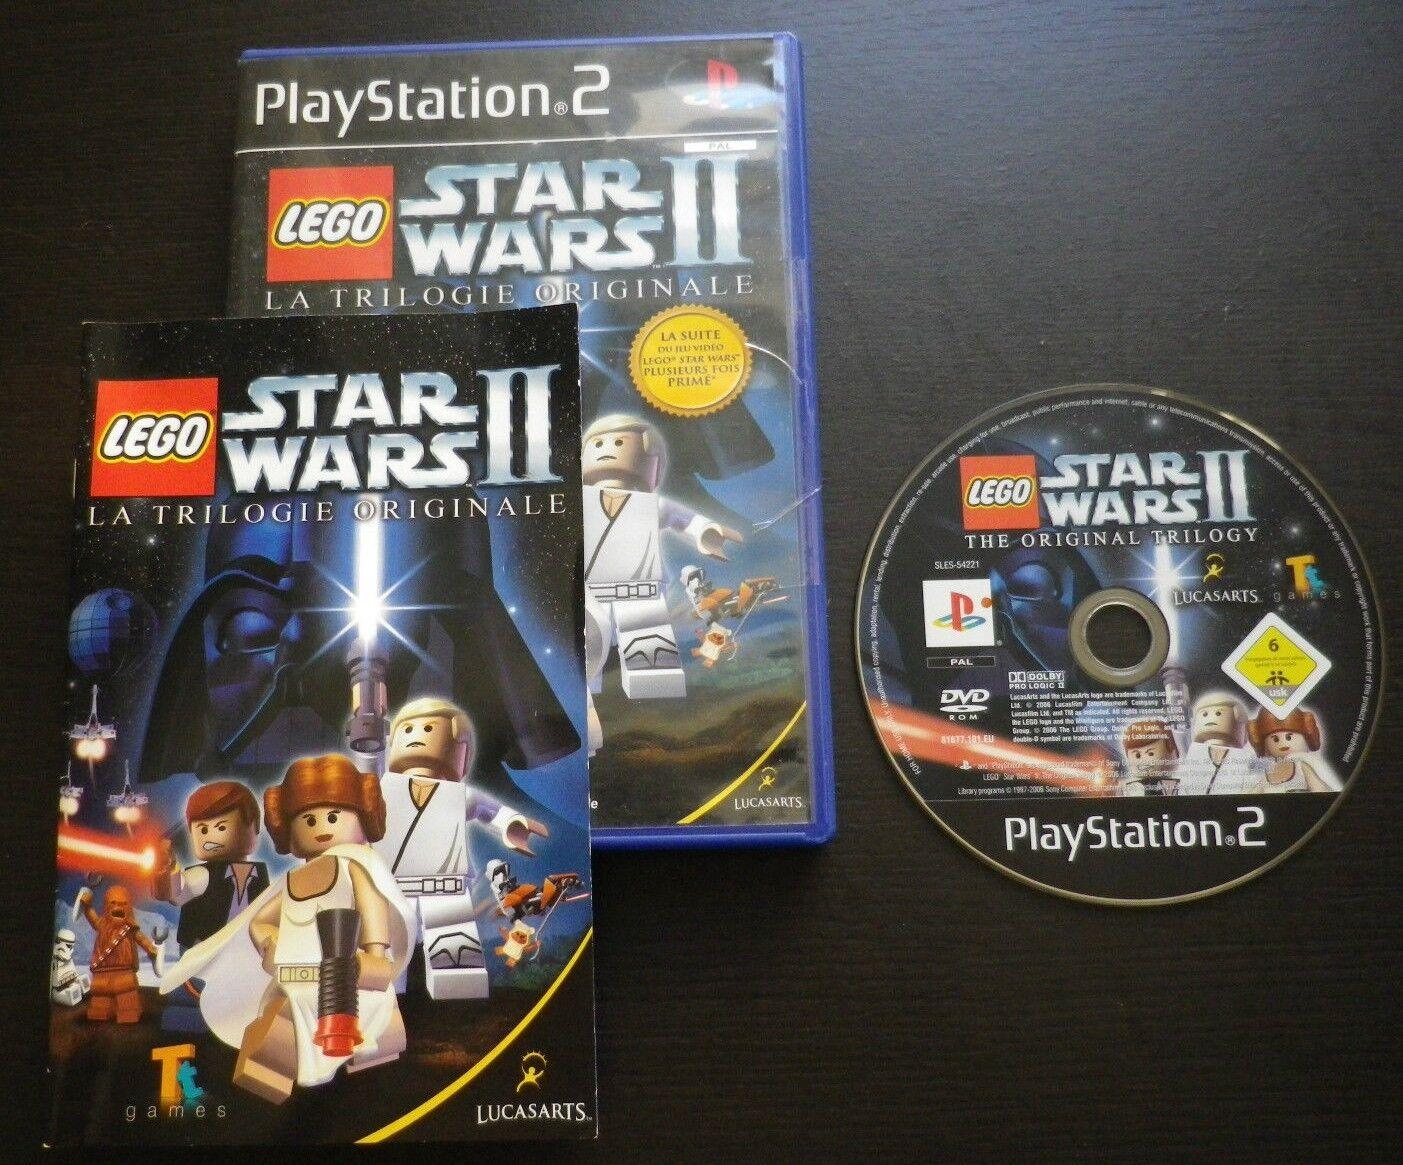 LEGO STAR WARS II LA TRILOGIE ORIGINALE : JEU - jeu StarWars